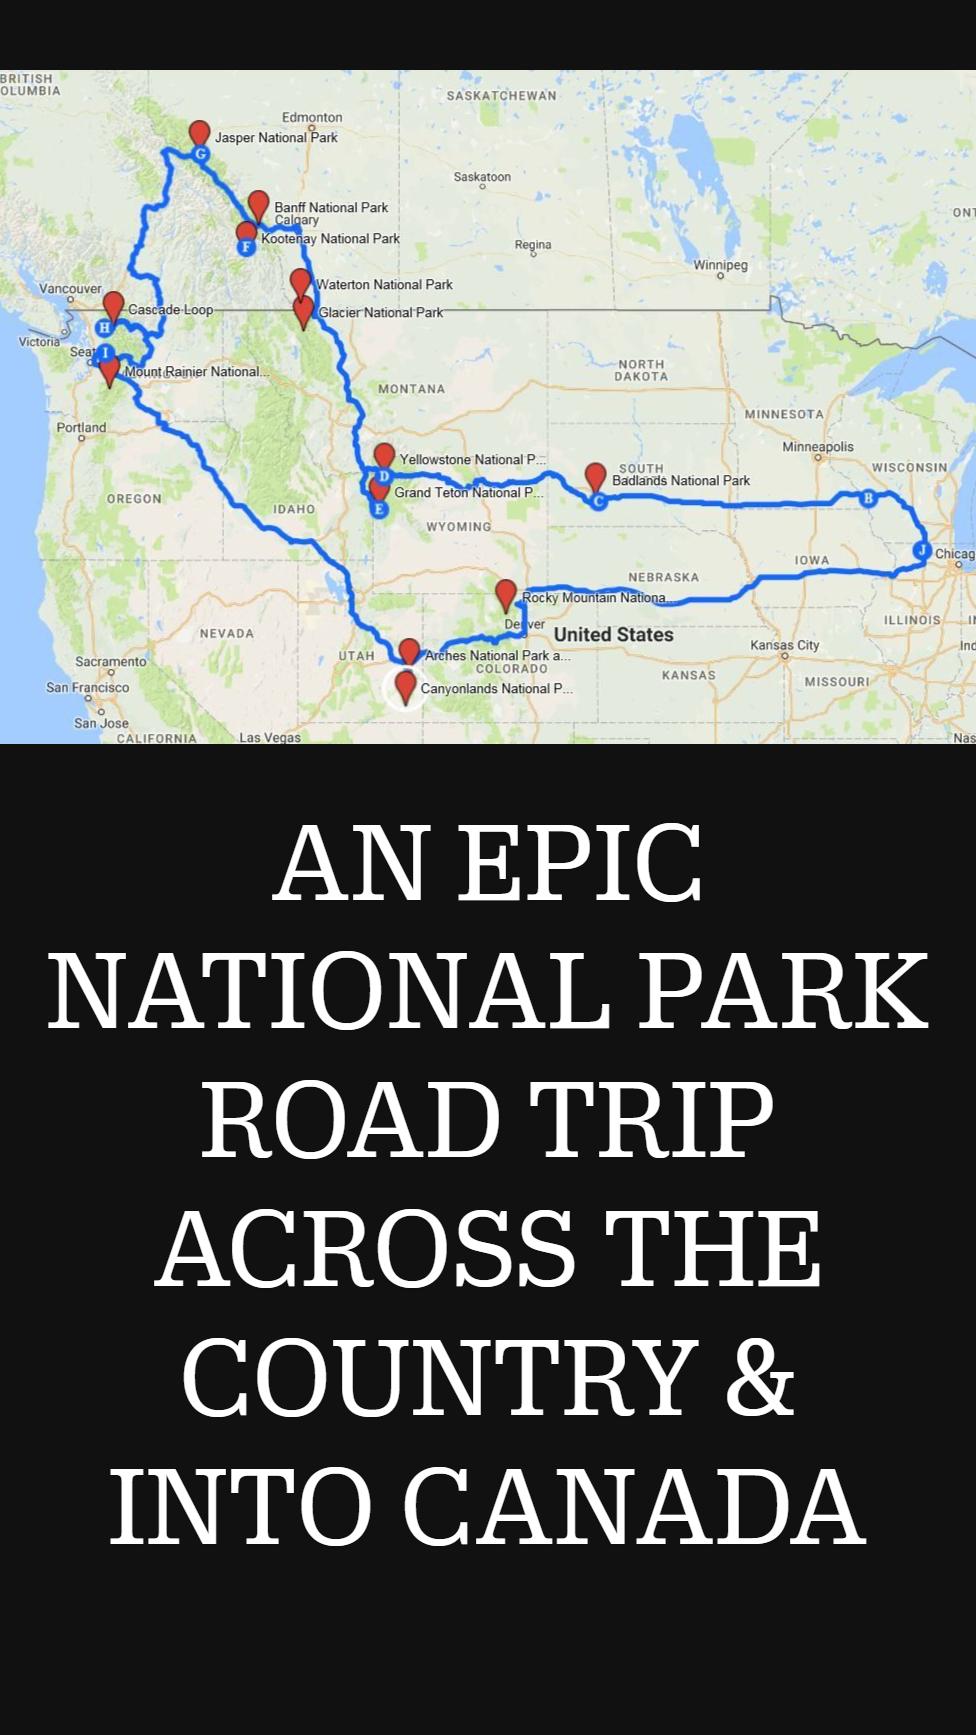 AN EPIC NATIONAL PARK ROAD TRIP